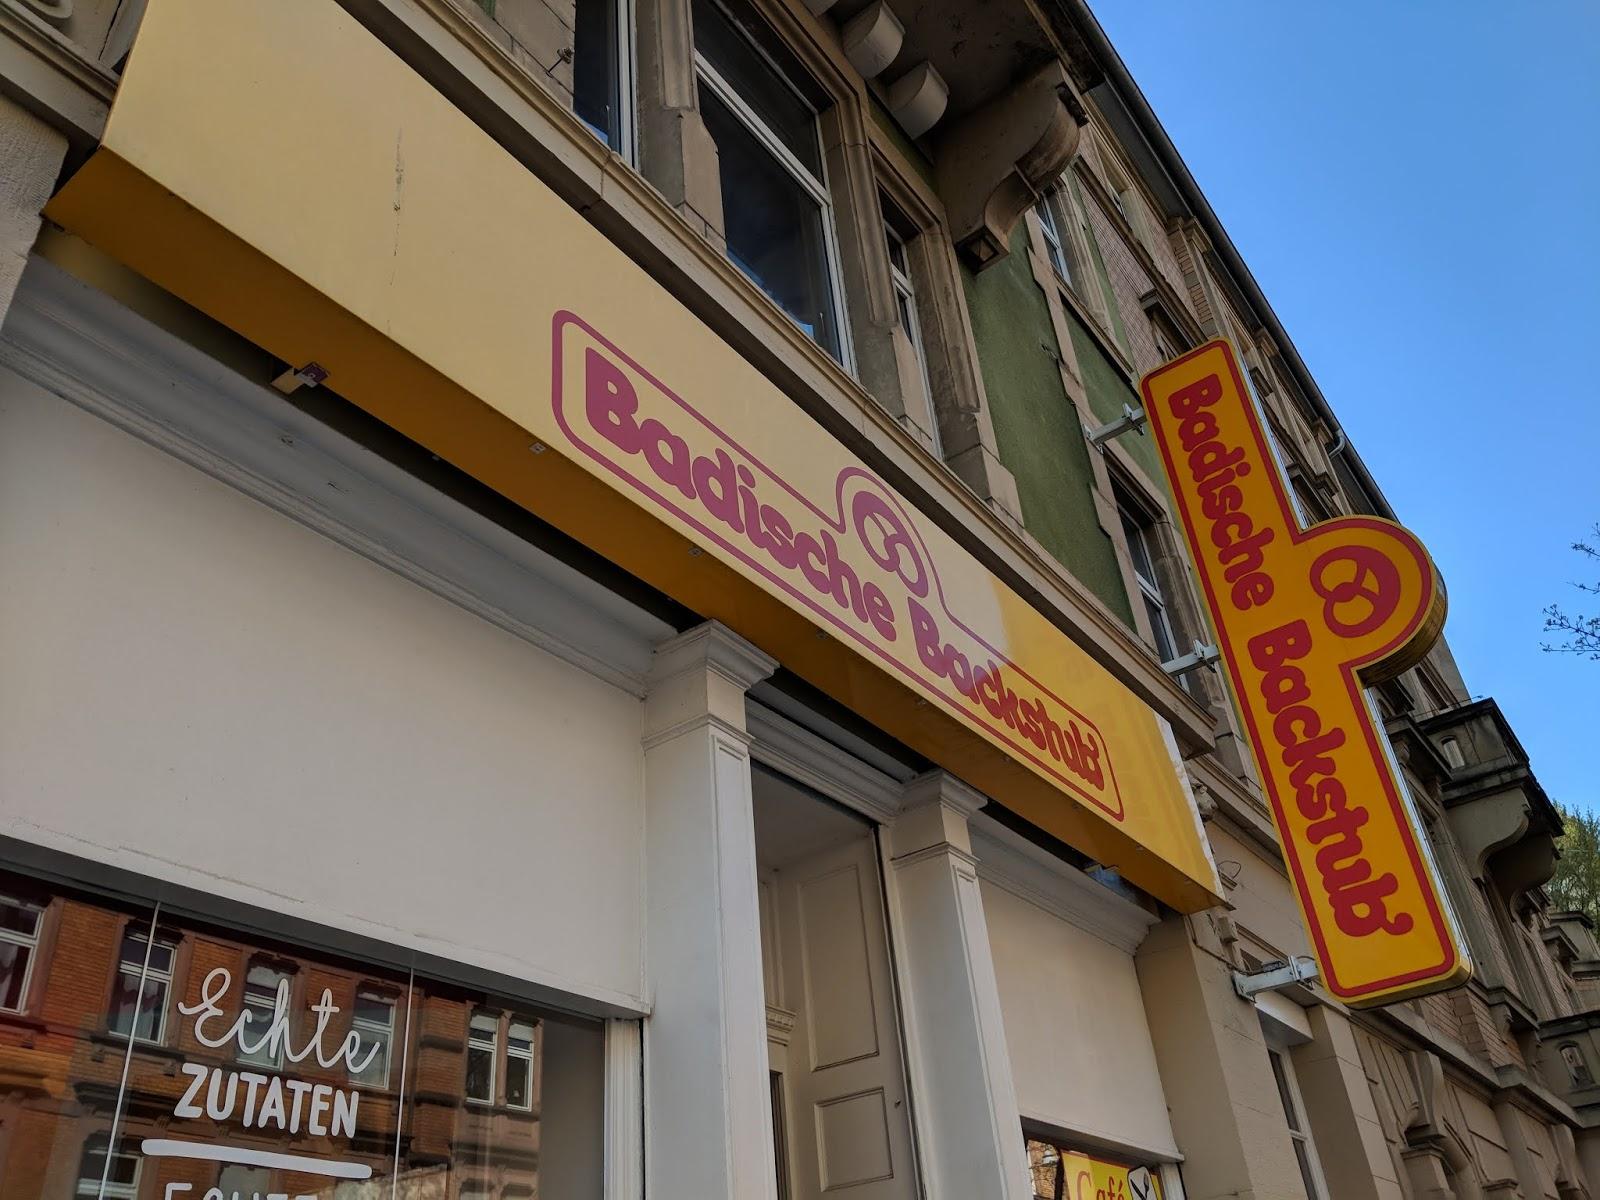 Badische Backstub Karlsruhe